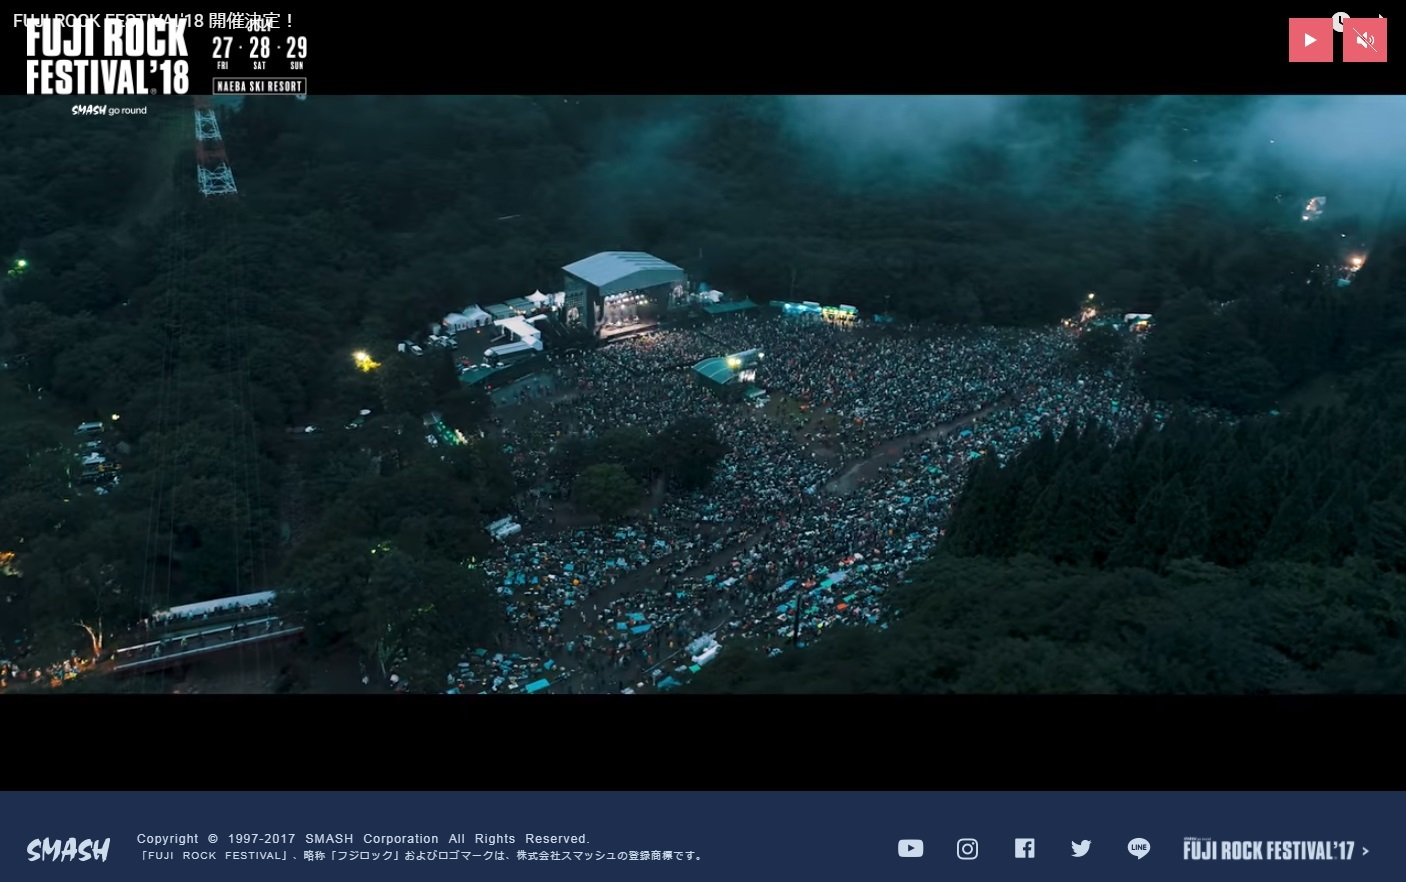 FUJI ROCK FESTIVAL オフィシャルサイトのスクリーンショット